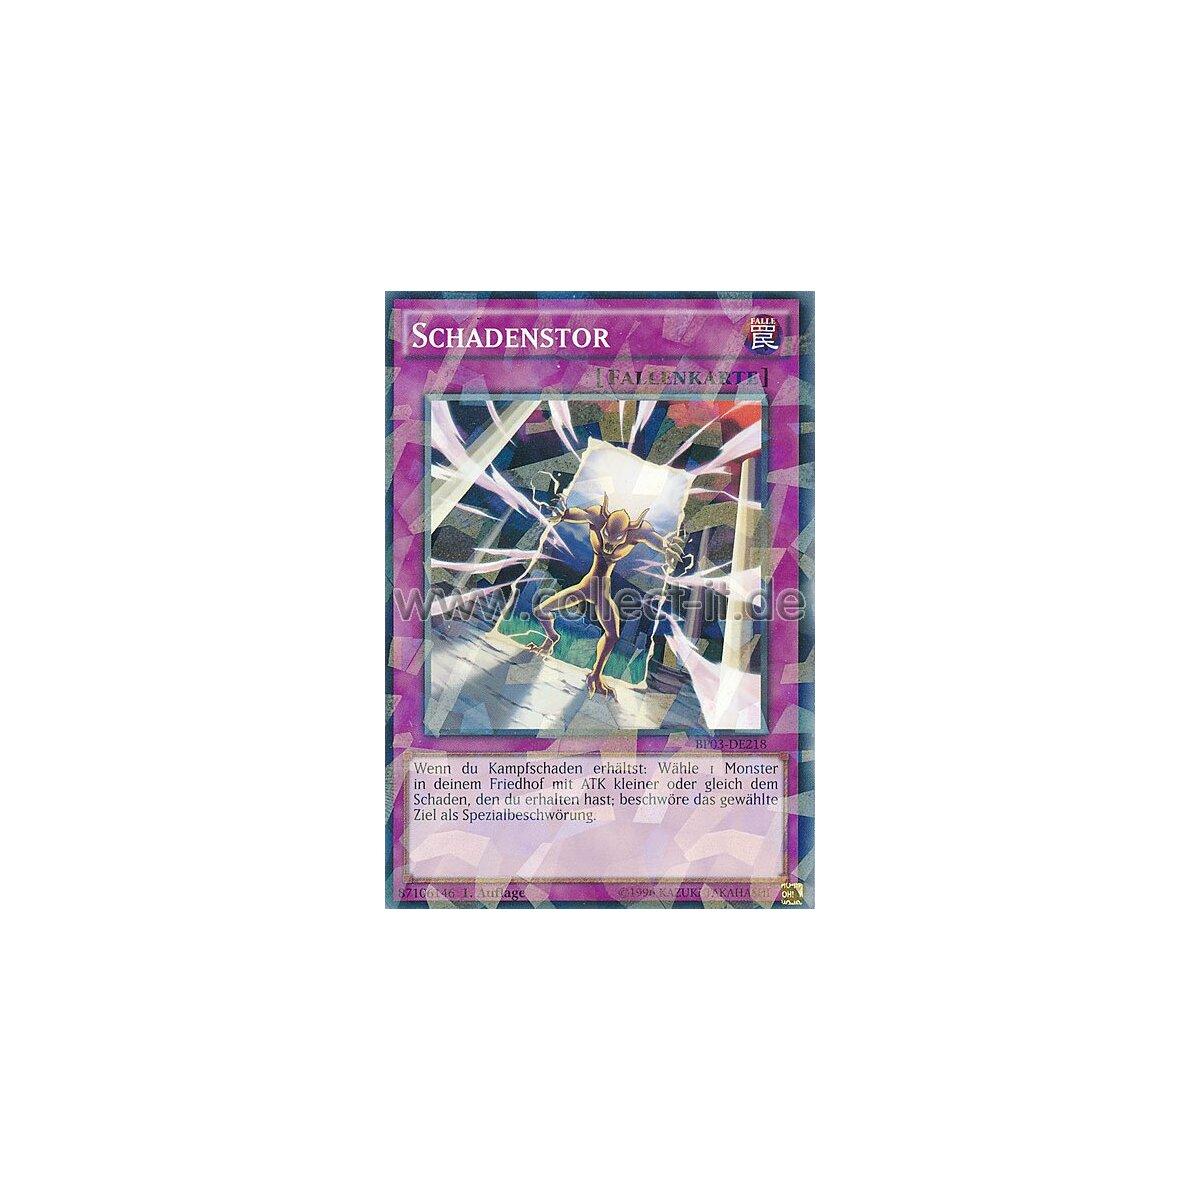 kaartspellen Yu-Gi-Oh! Intrigenschild BP03-DE231 1 Auflage